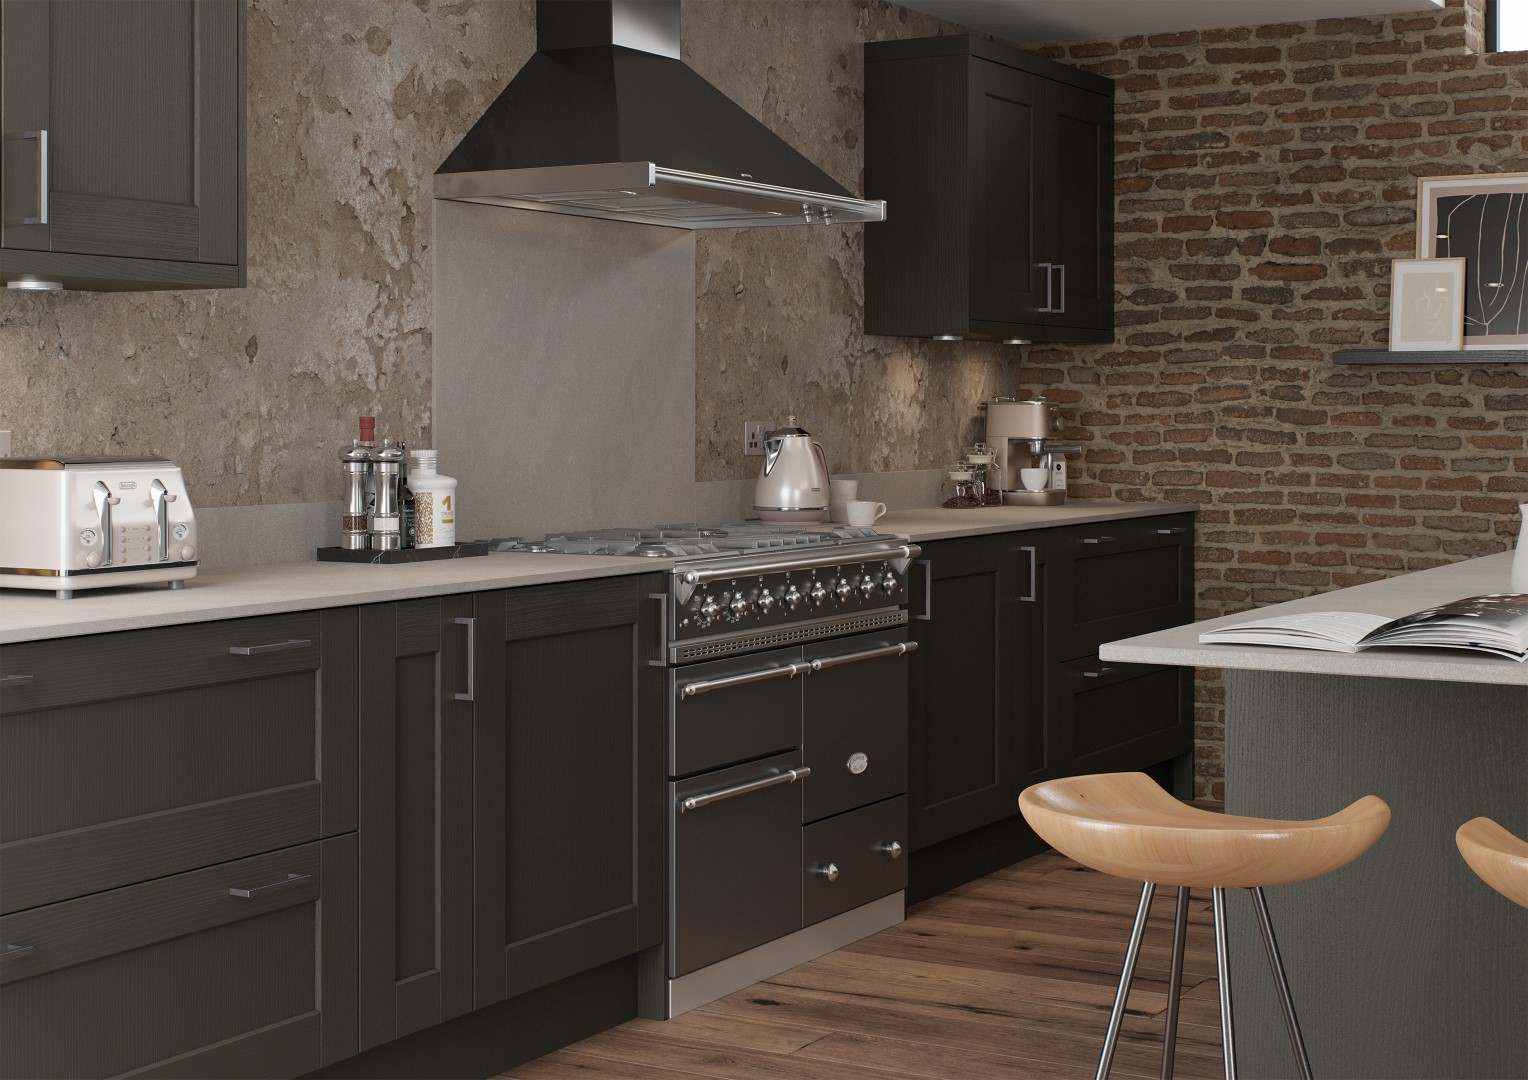 Kensington Graphite - Kitchen Design - Alan Kelly Kitchens Waterford - 2